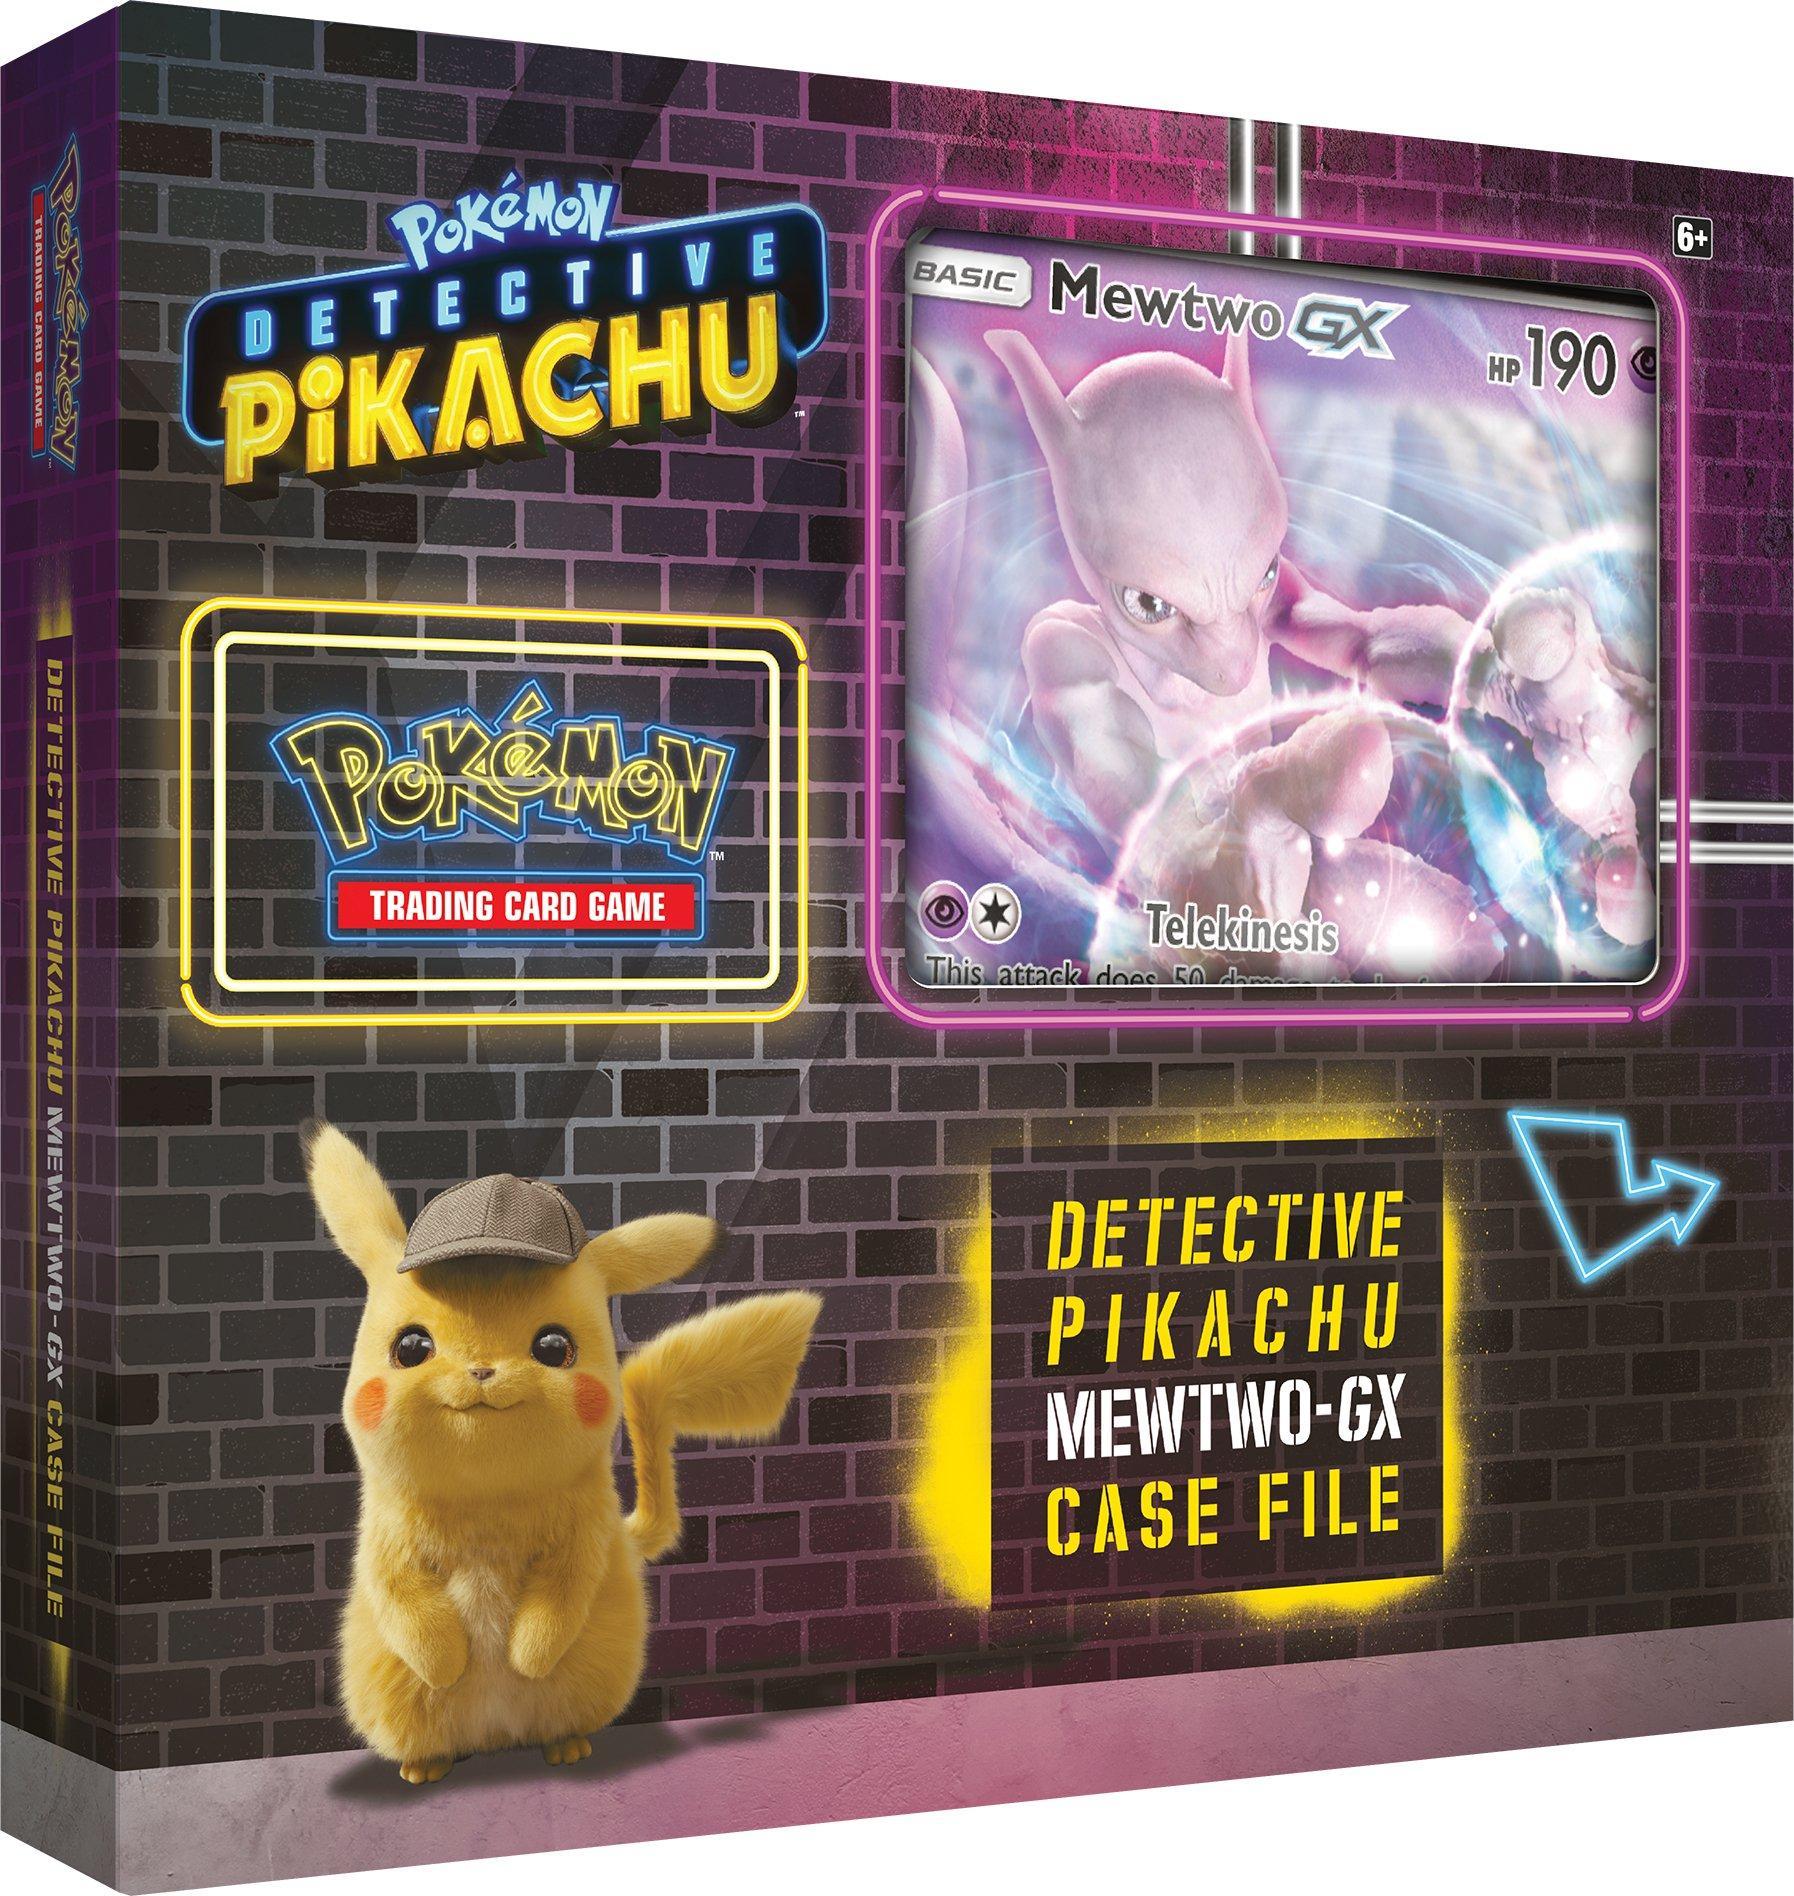 Pokemon Trading Card Game Detective Pikachu Mewtwo Gx Case